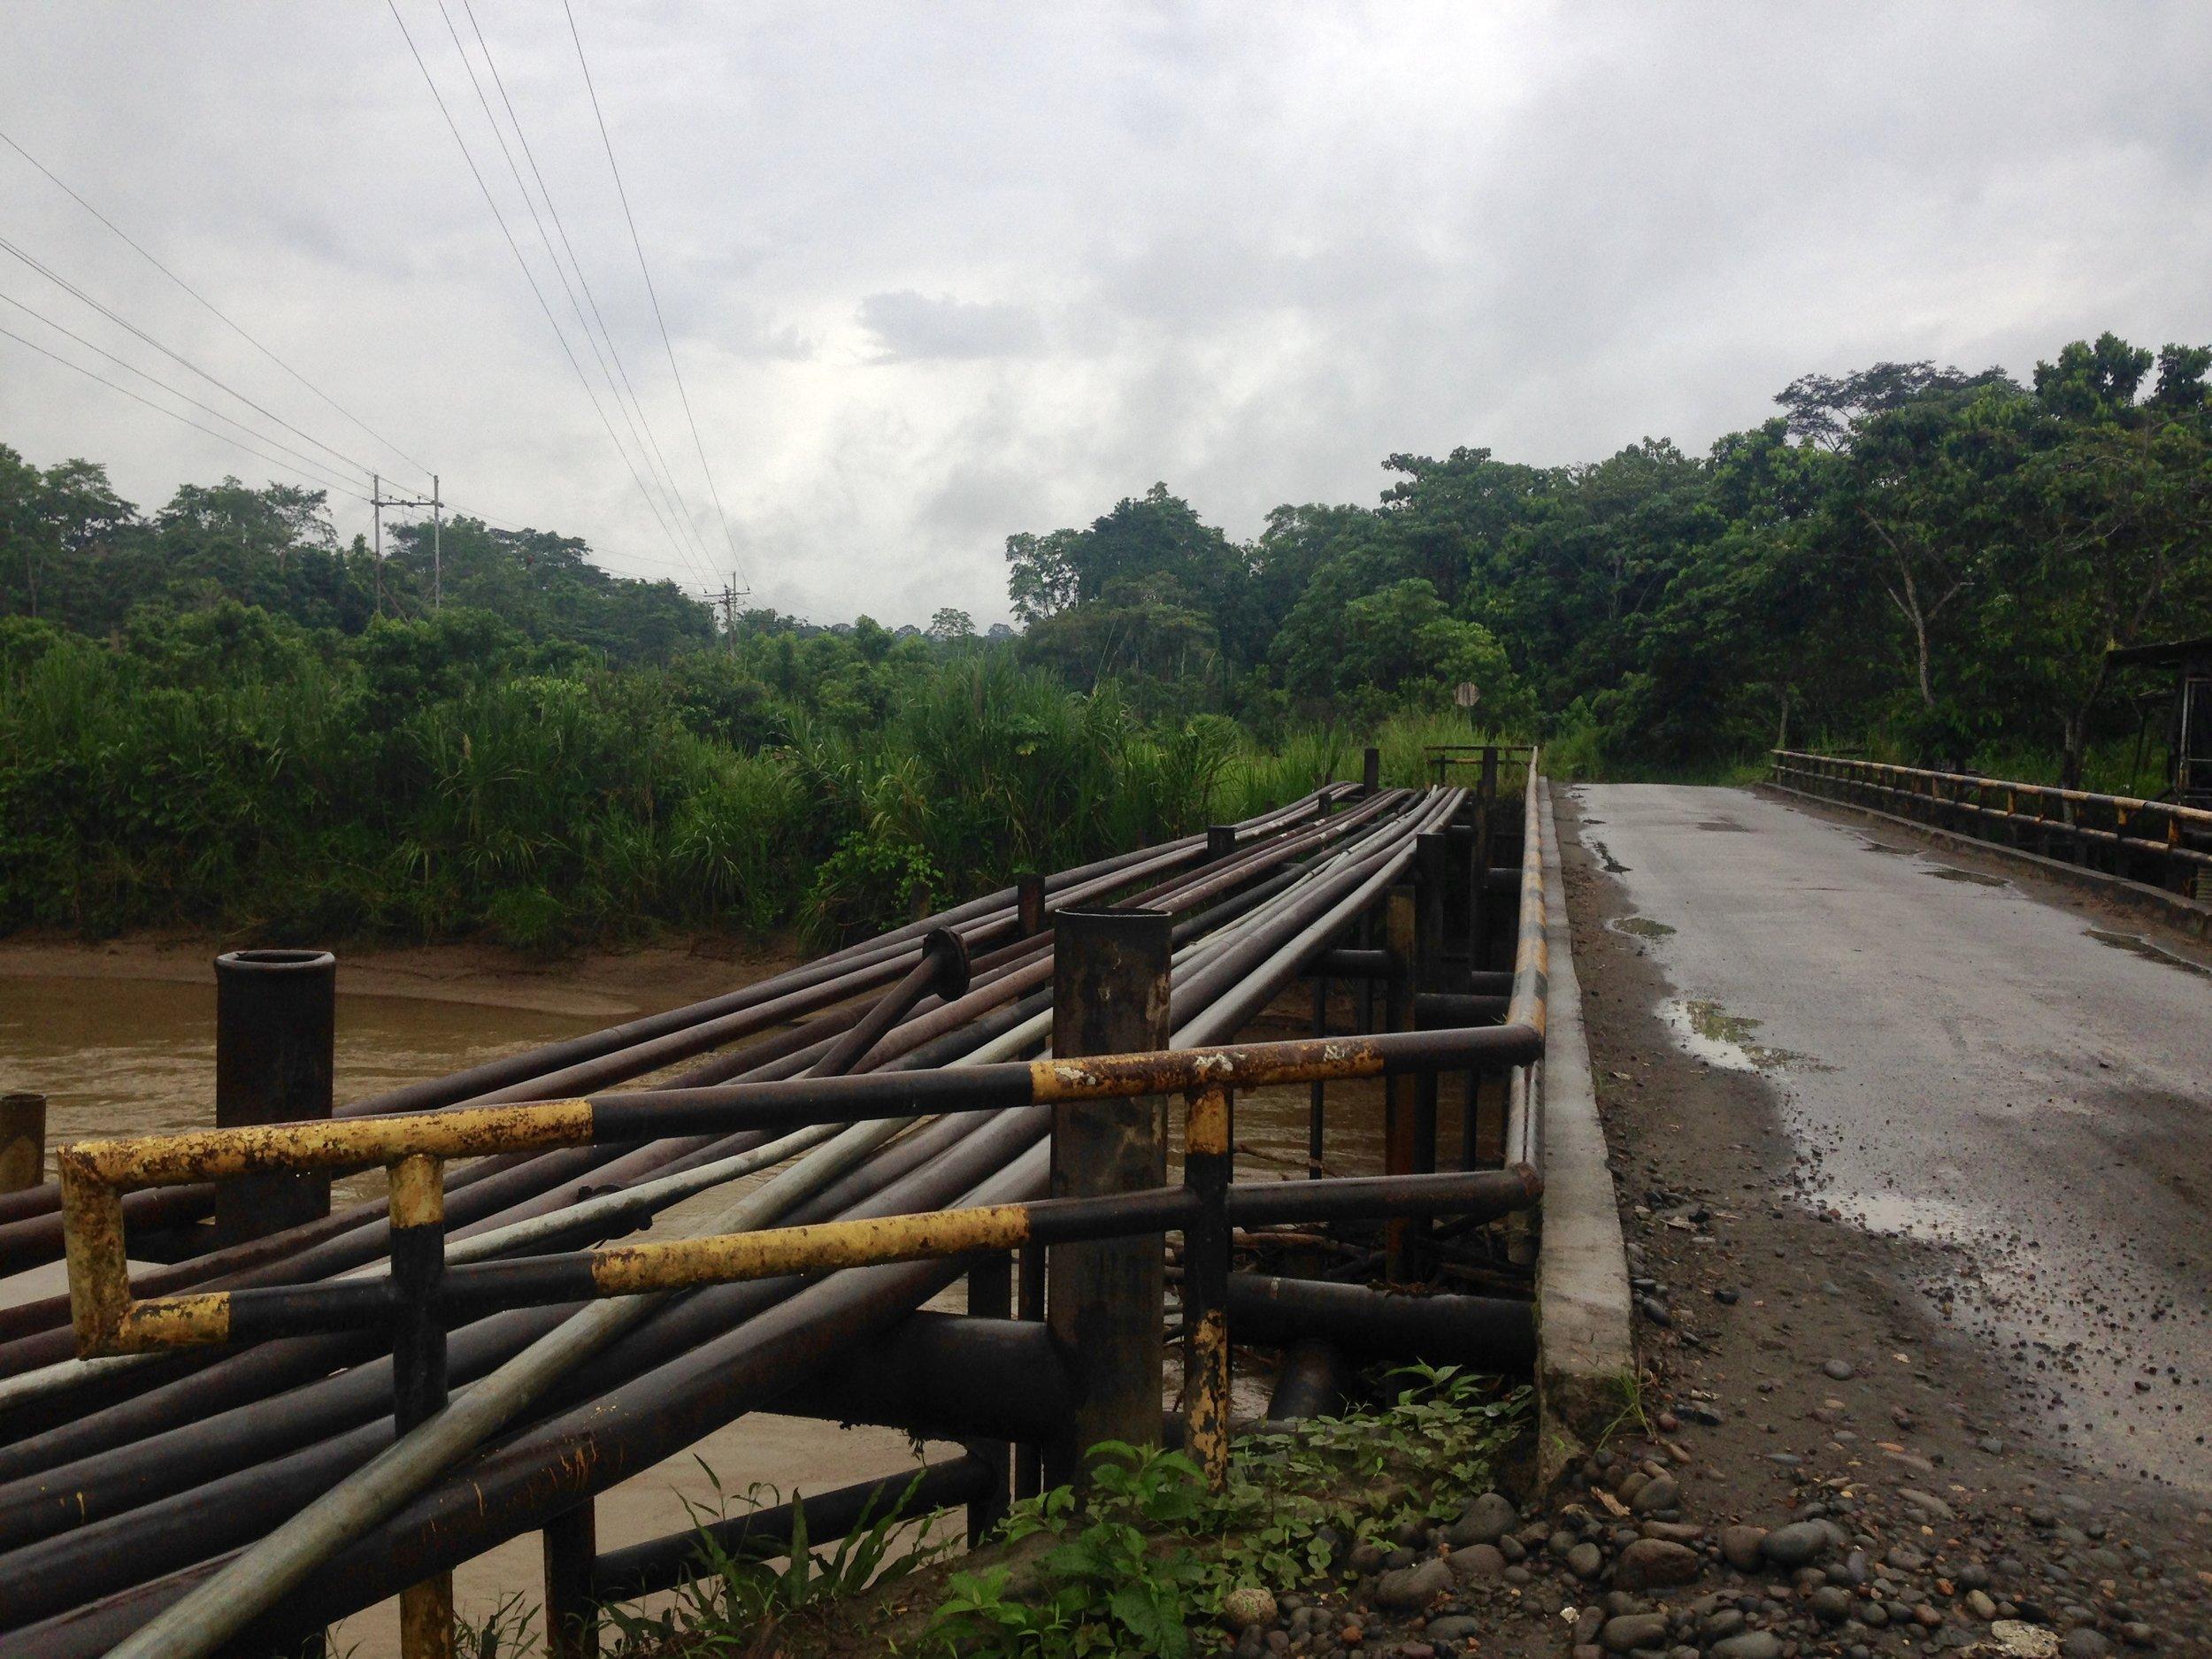 Photo: Megan Alpert, Ecuador 2015